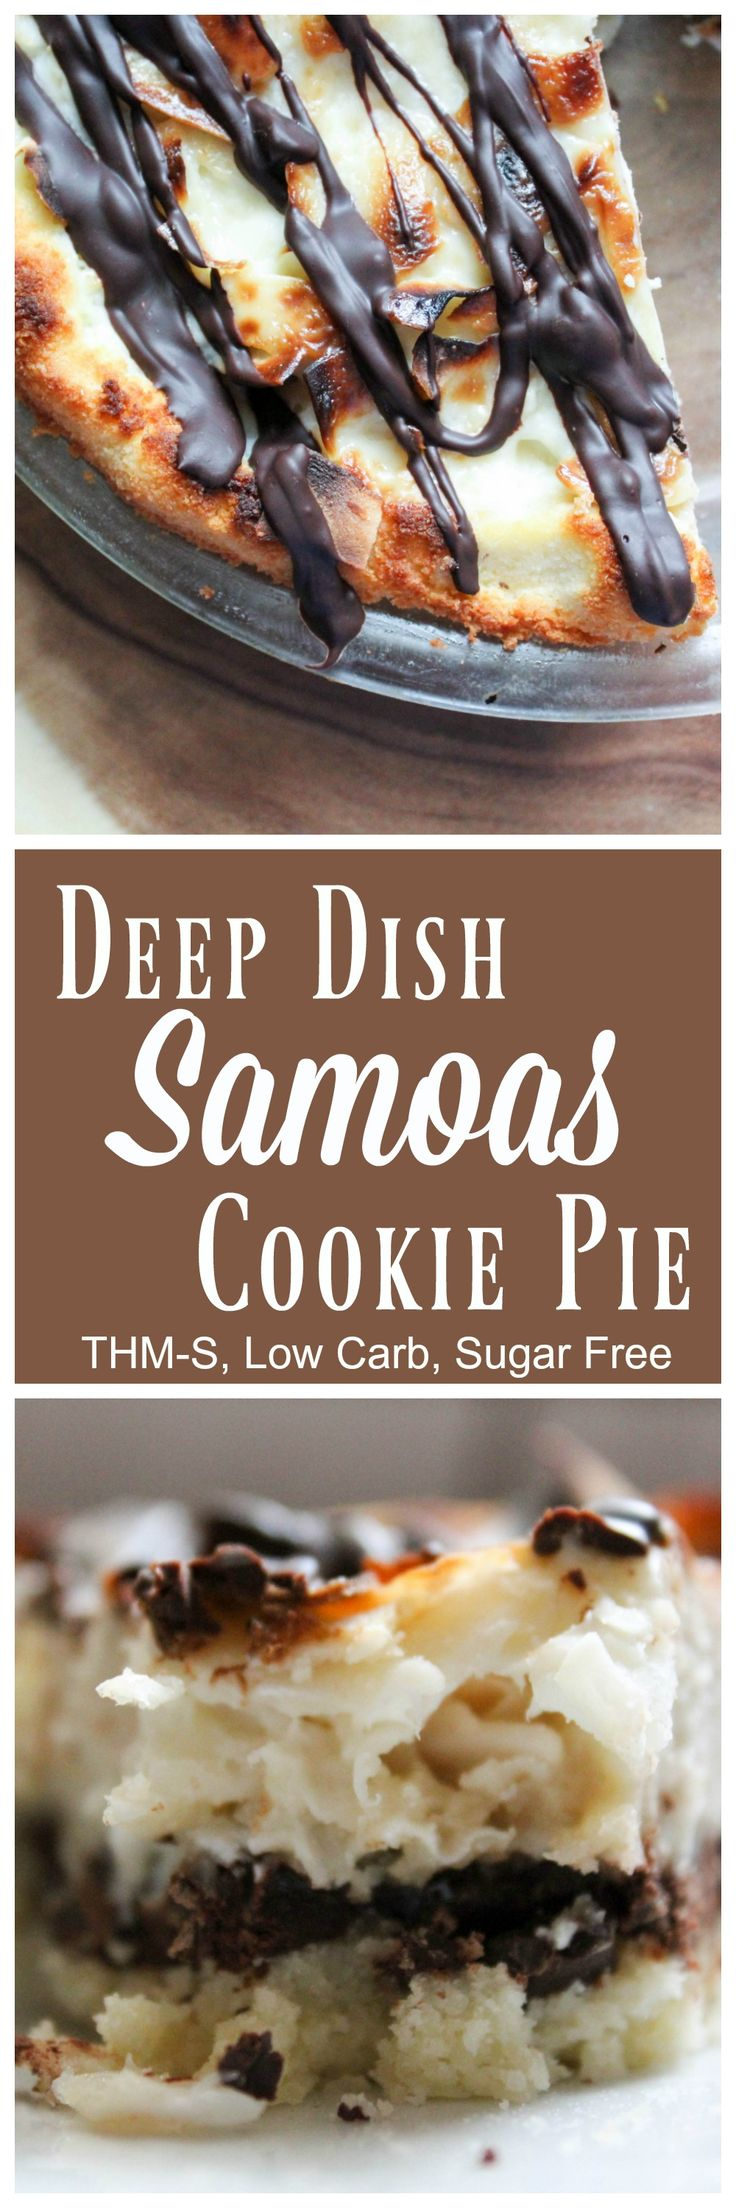 Deep Dish Samoas Cookie Pie {THM-S, Low Carb, Sugar Free}   My Montana Kitchen Recipes for Trim ...